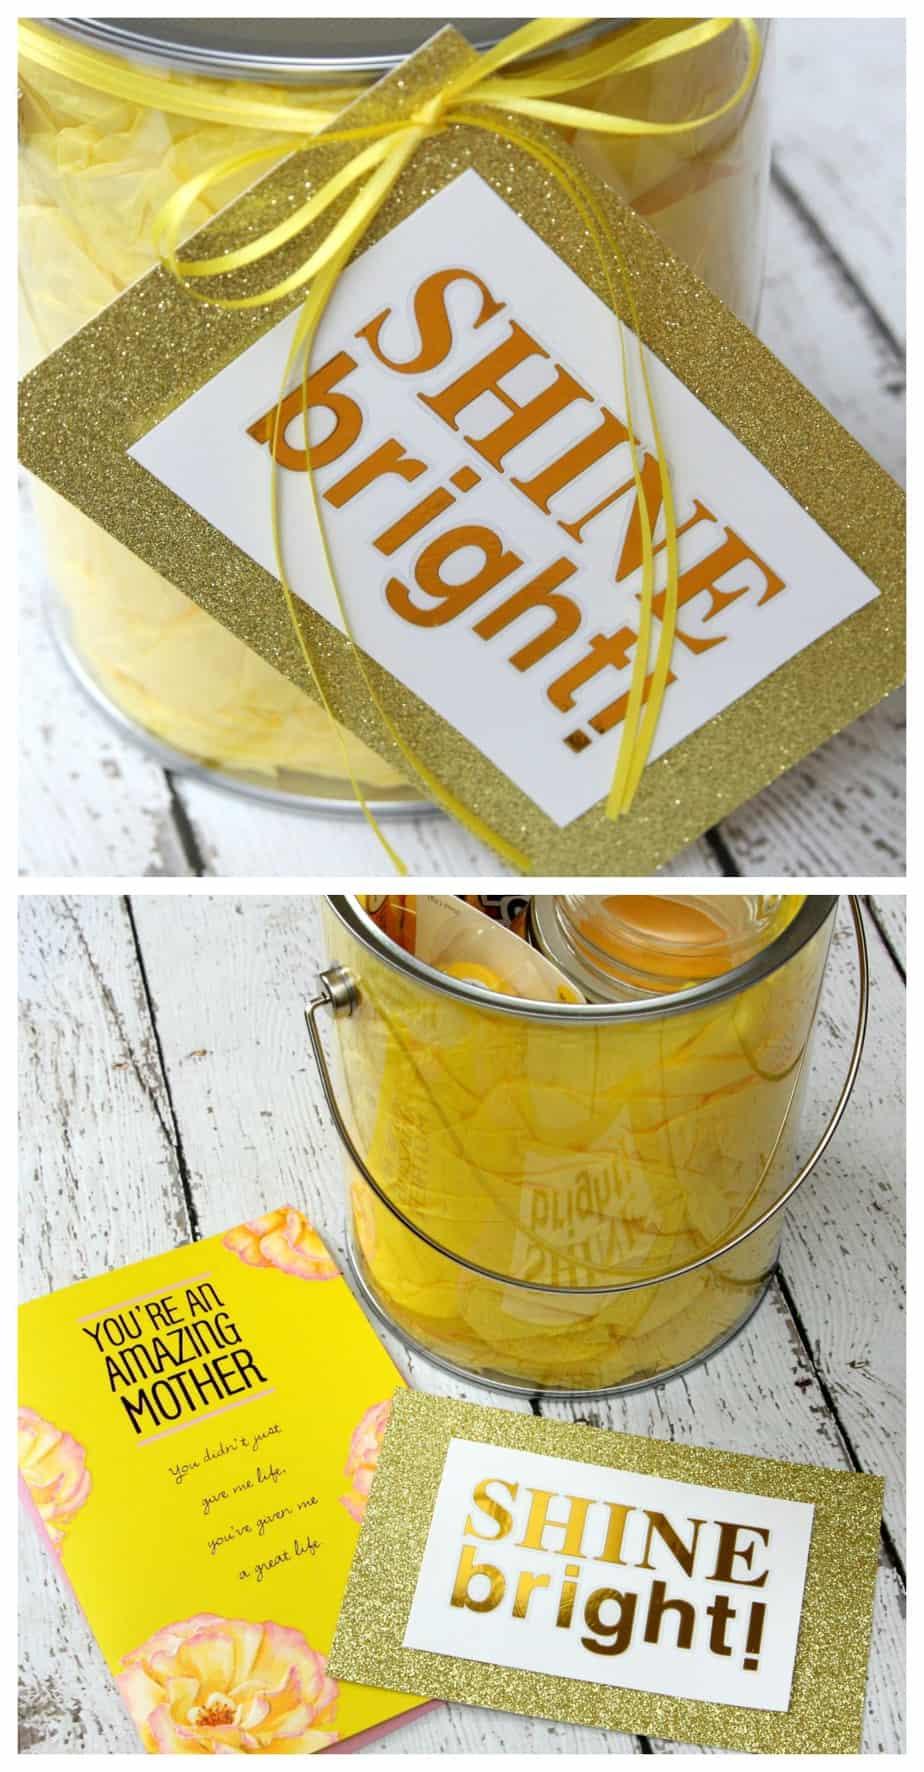 Shine Bright Gift Idea #BestMomsDayEver #Ad